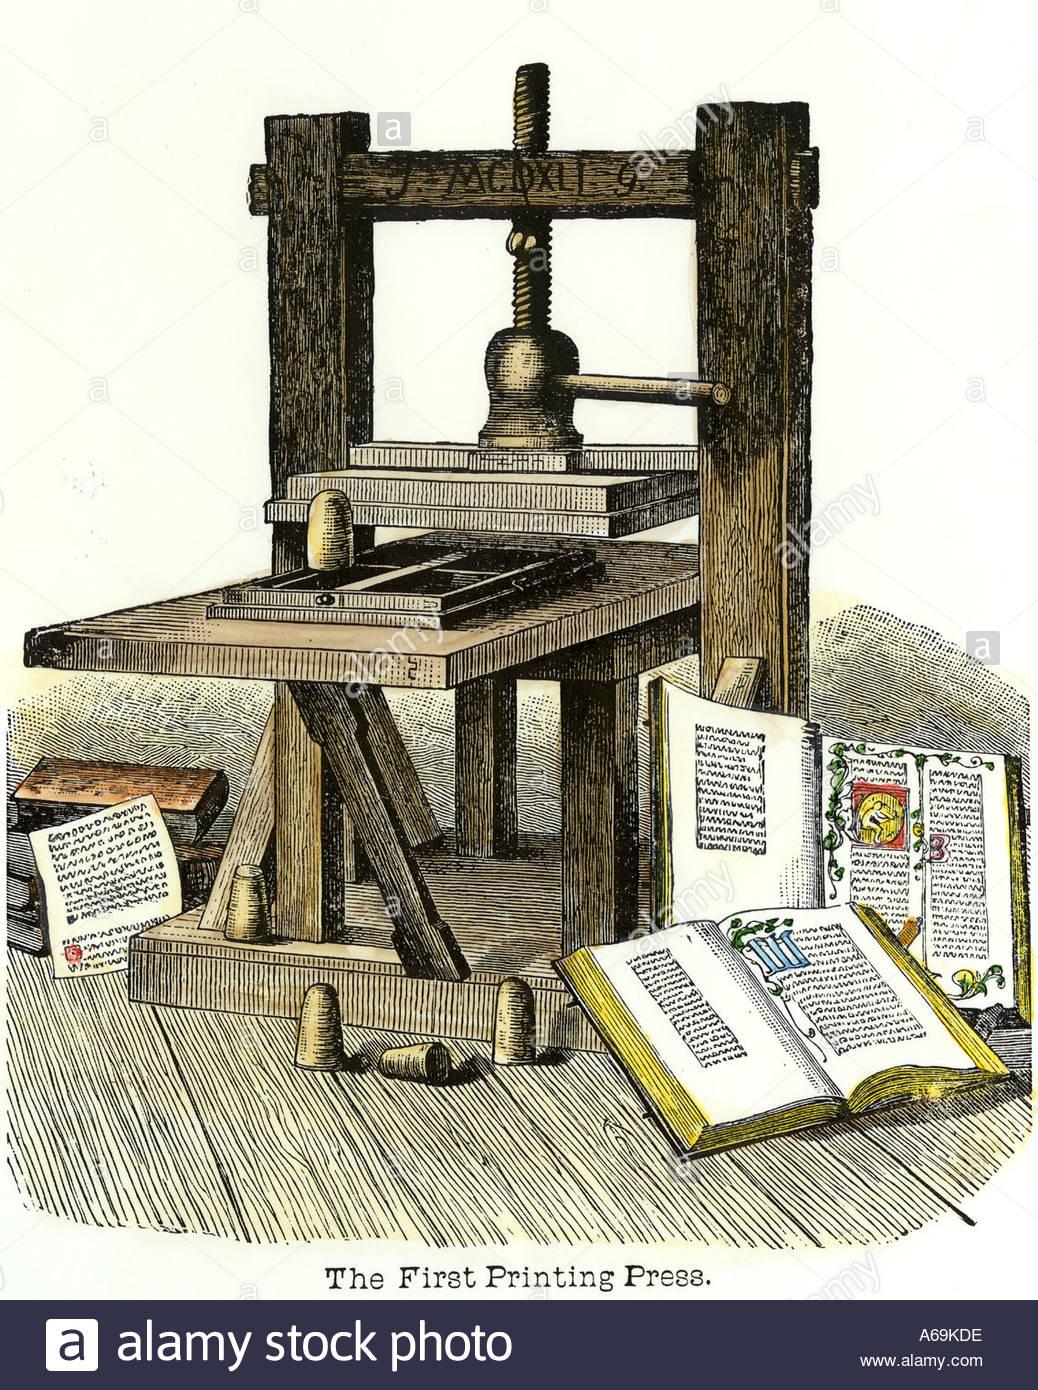 Snap The Gutenberg Press My Awol Life Photos On Pinterest Printing Diagram Gutenbergprintingpressjpg Books Without Paper E Justification Of Johann